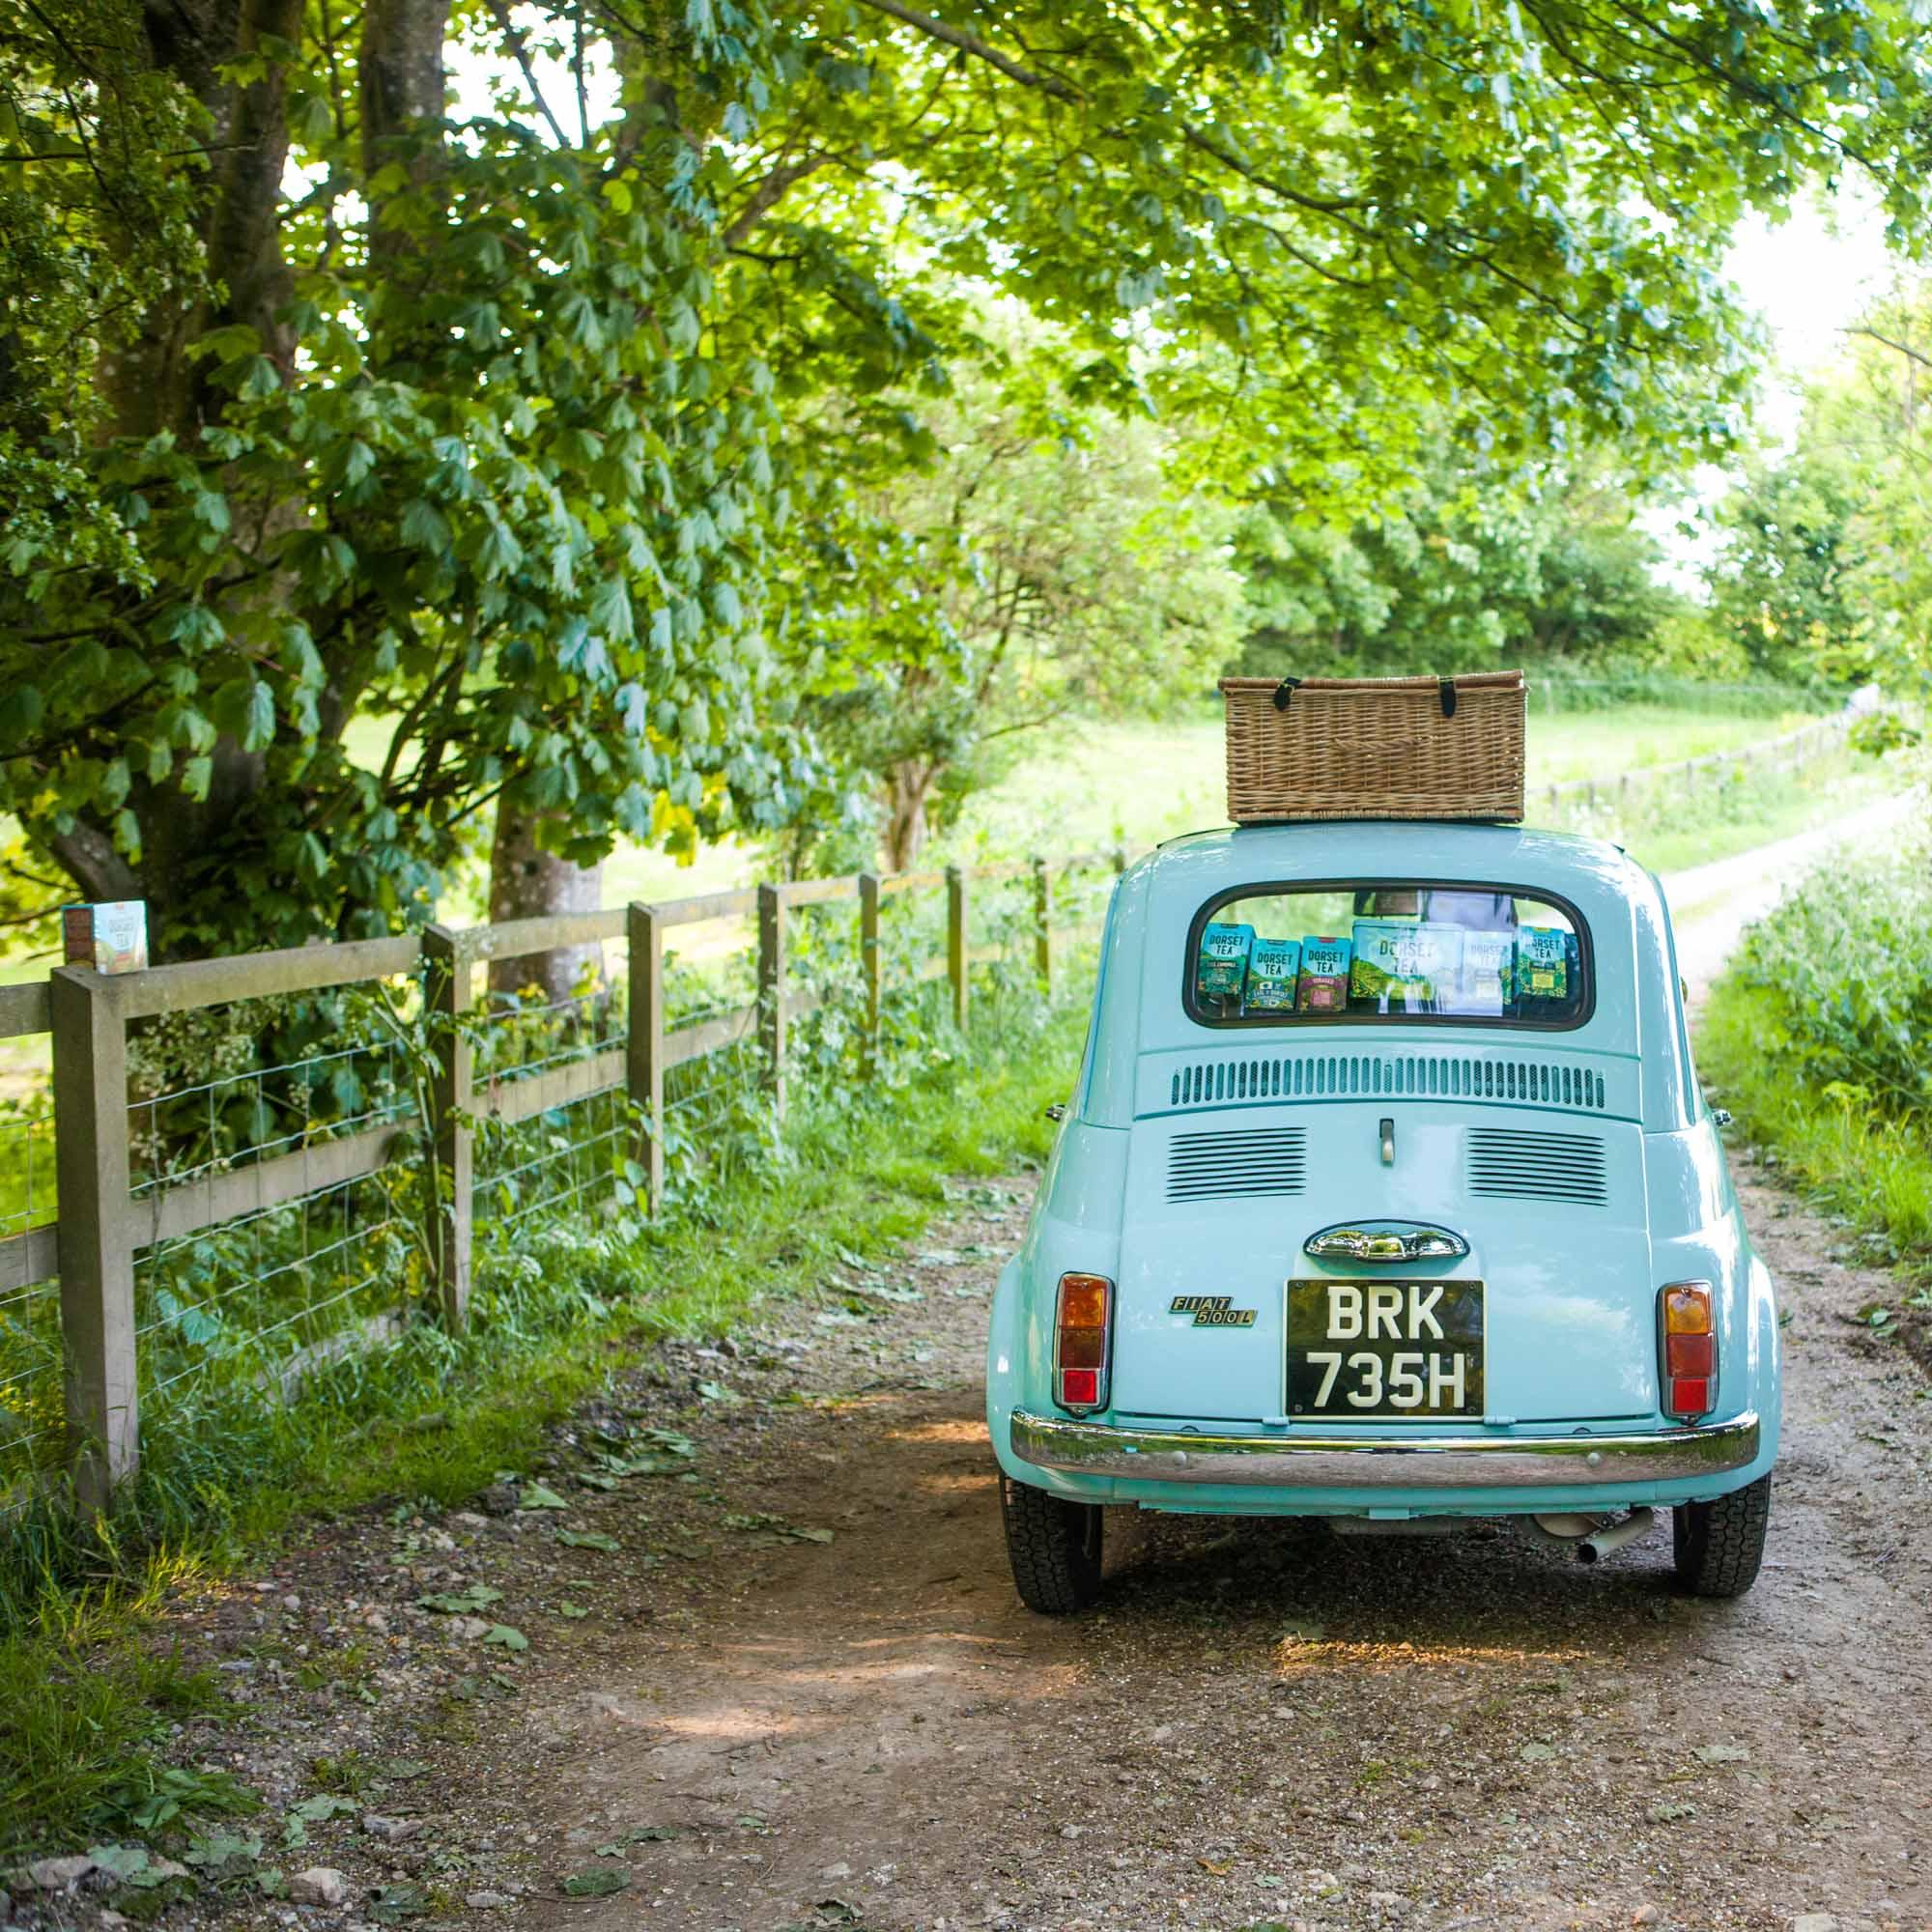 Tea fiat, Dorset- Lifestyle photographer